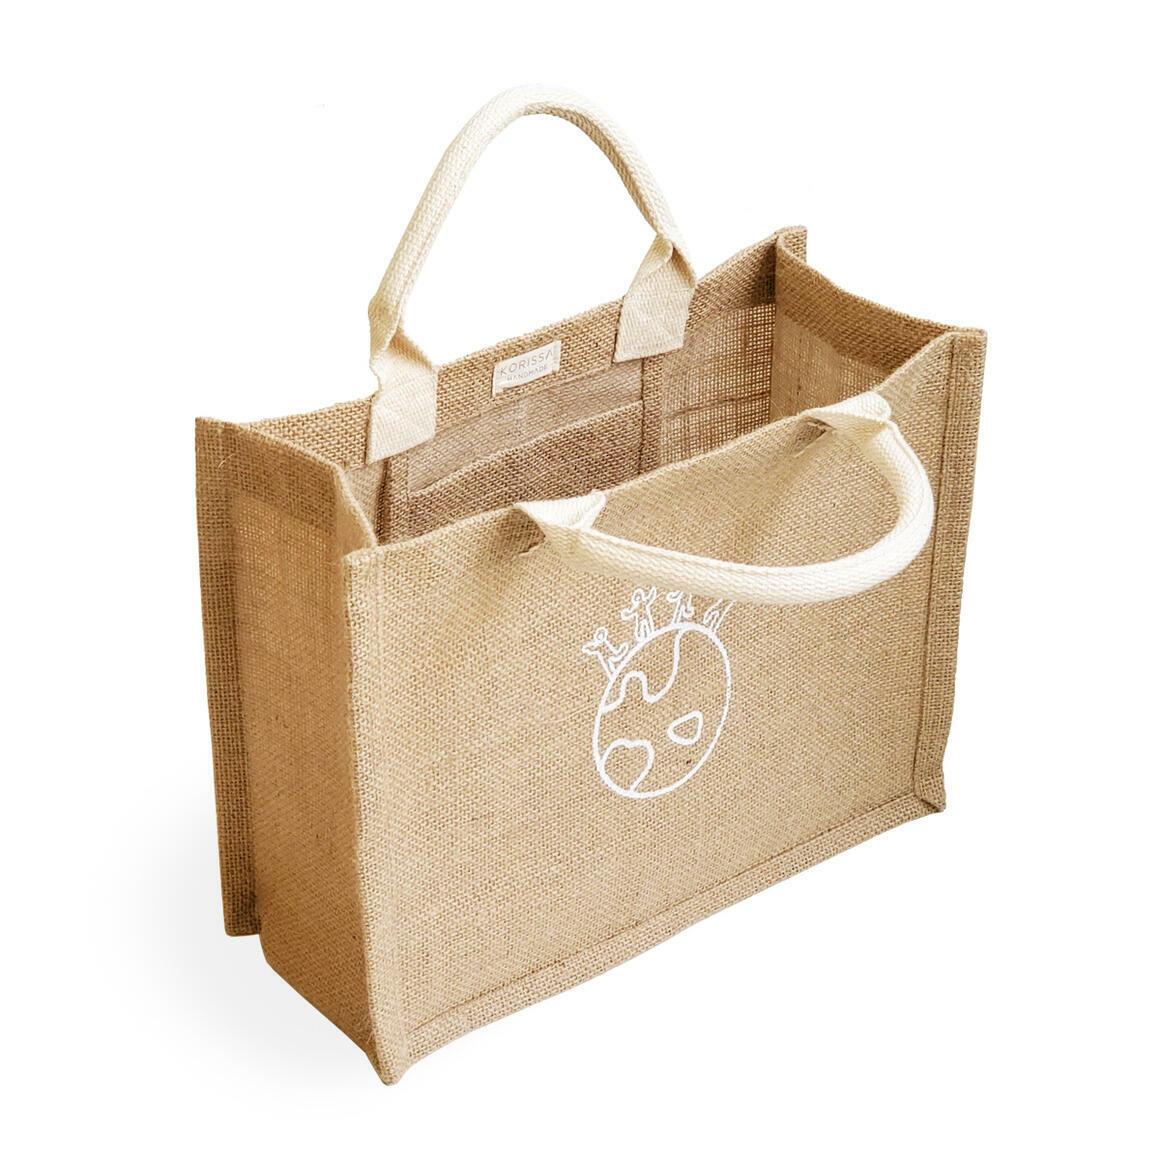 Gift Bag - Earth | Trada Marketplace